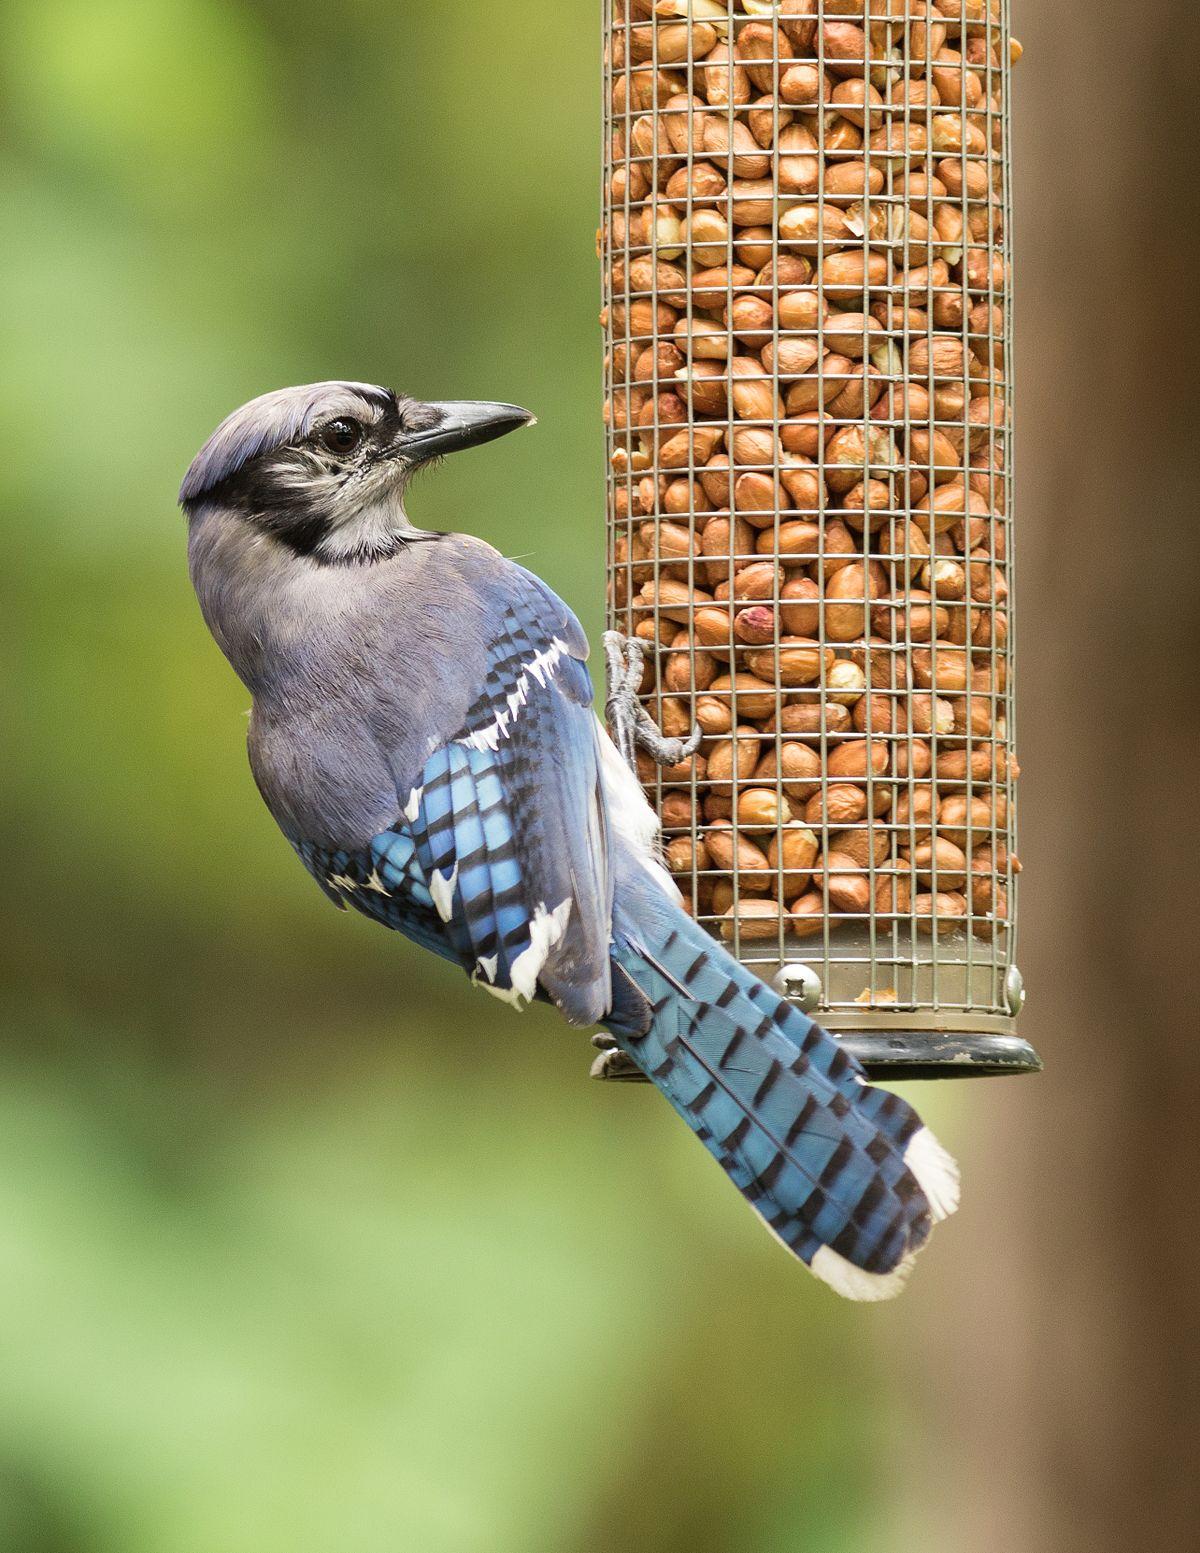 Blue_jay_(Cyanocitta_cristata)_on_bird_feeder.jpg